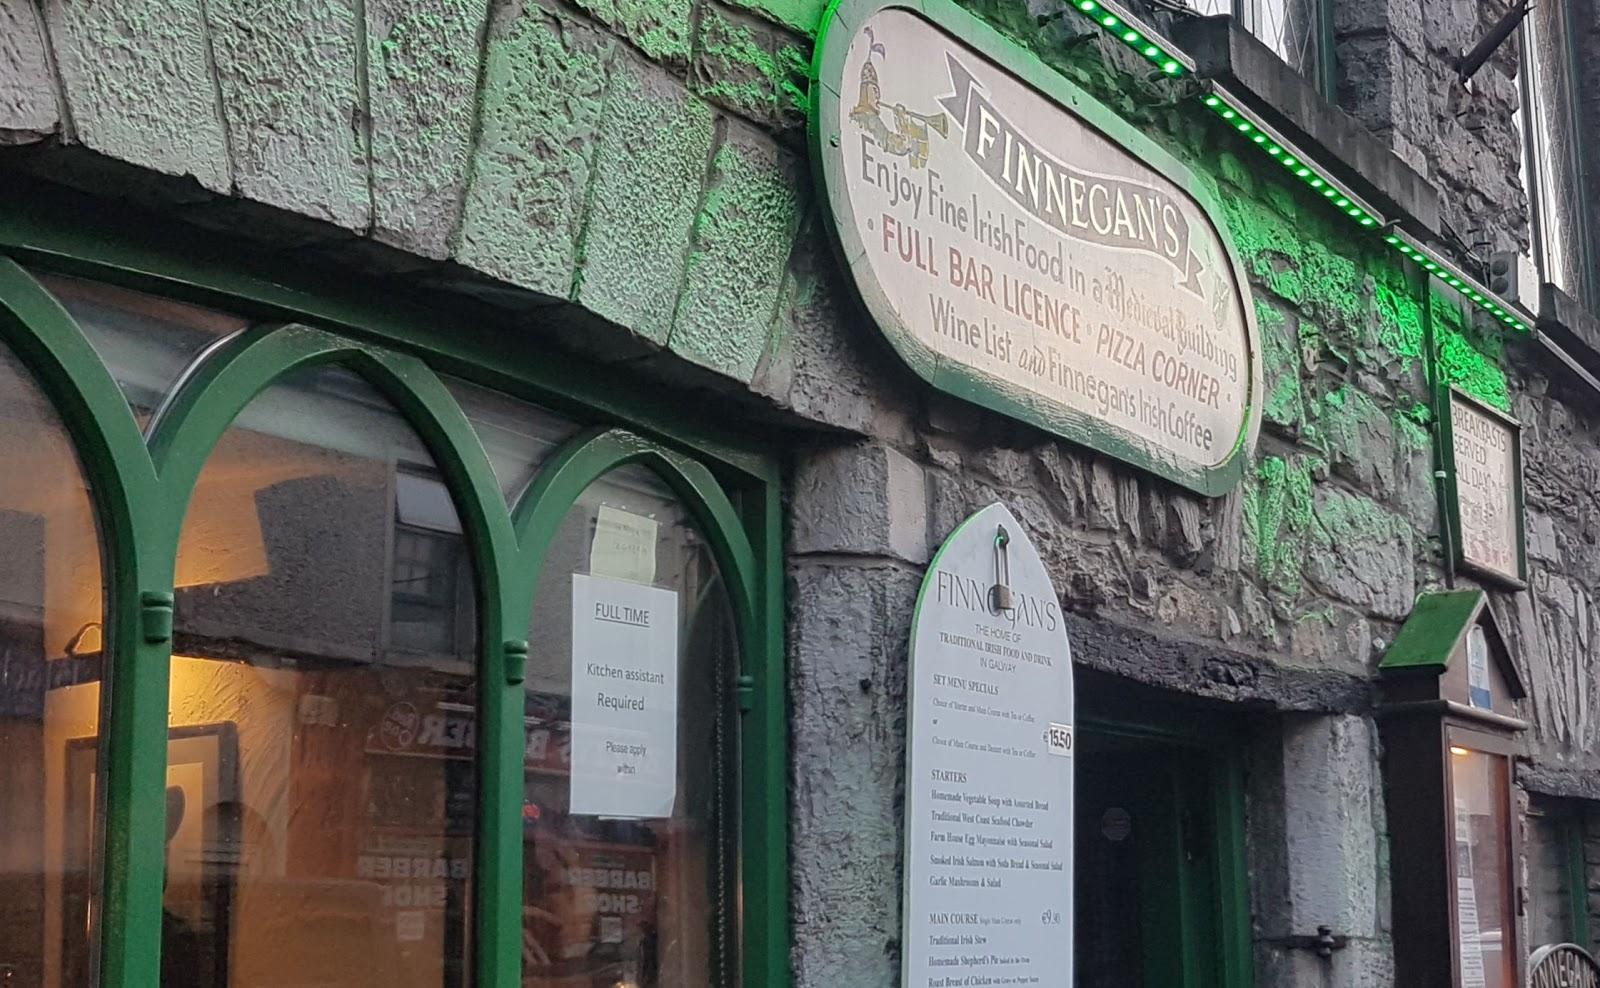 Finnegans - enjoy fine Irish food in a medievalbuilding - full bar licence - pizza corner - full wine list - Irish coffees - restaurant bright green lighting and arched windows